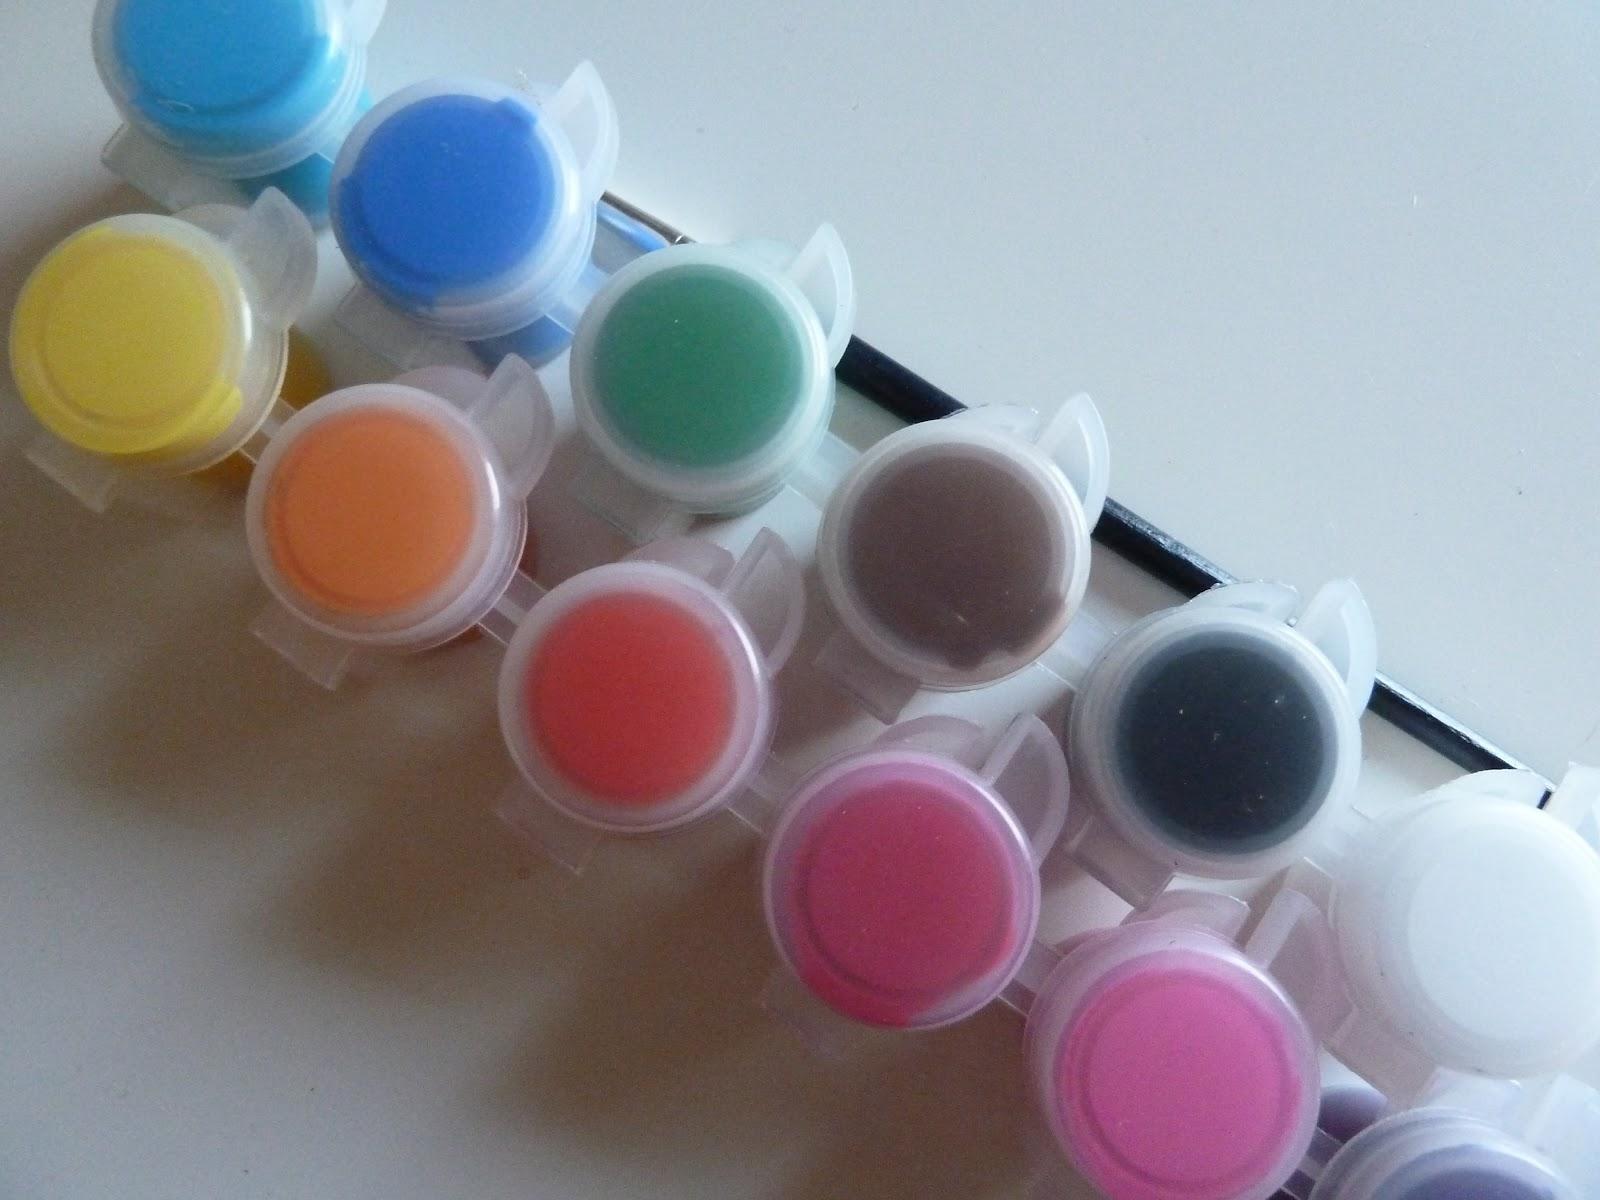 Nailsbystephanie acrylic paint as nail polish acrylic paint as nail polish prinsesfo Choice Image